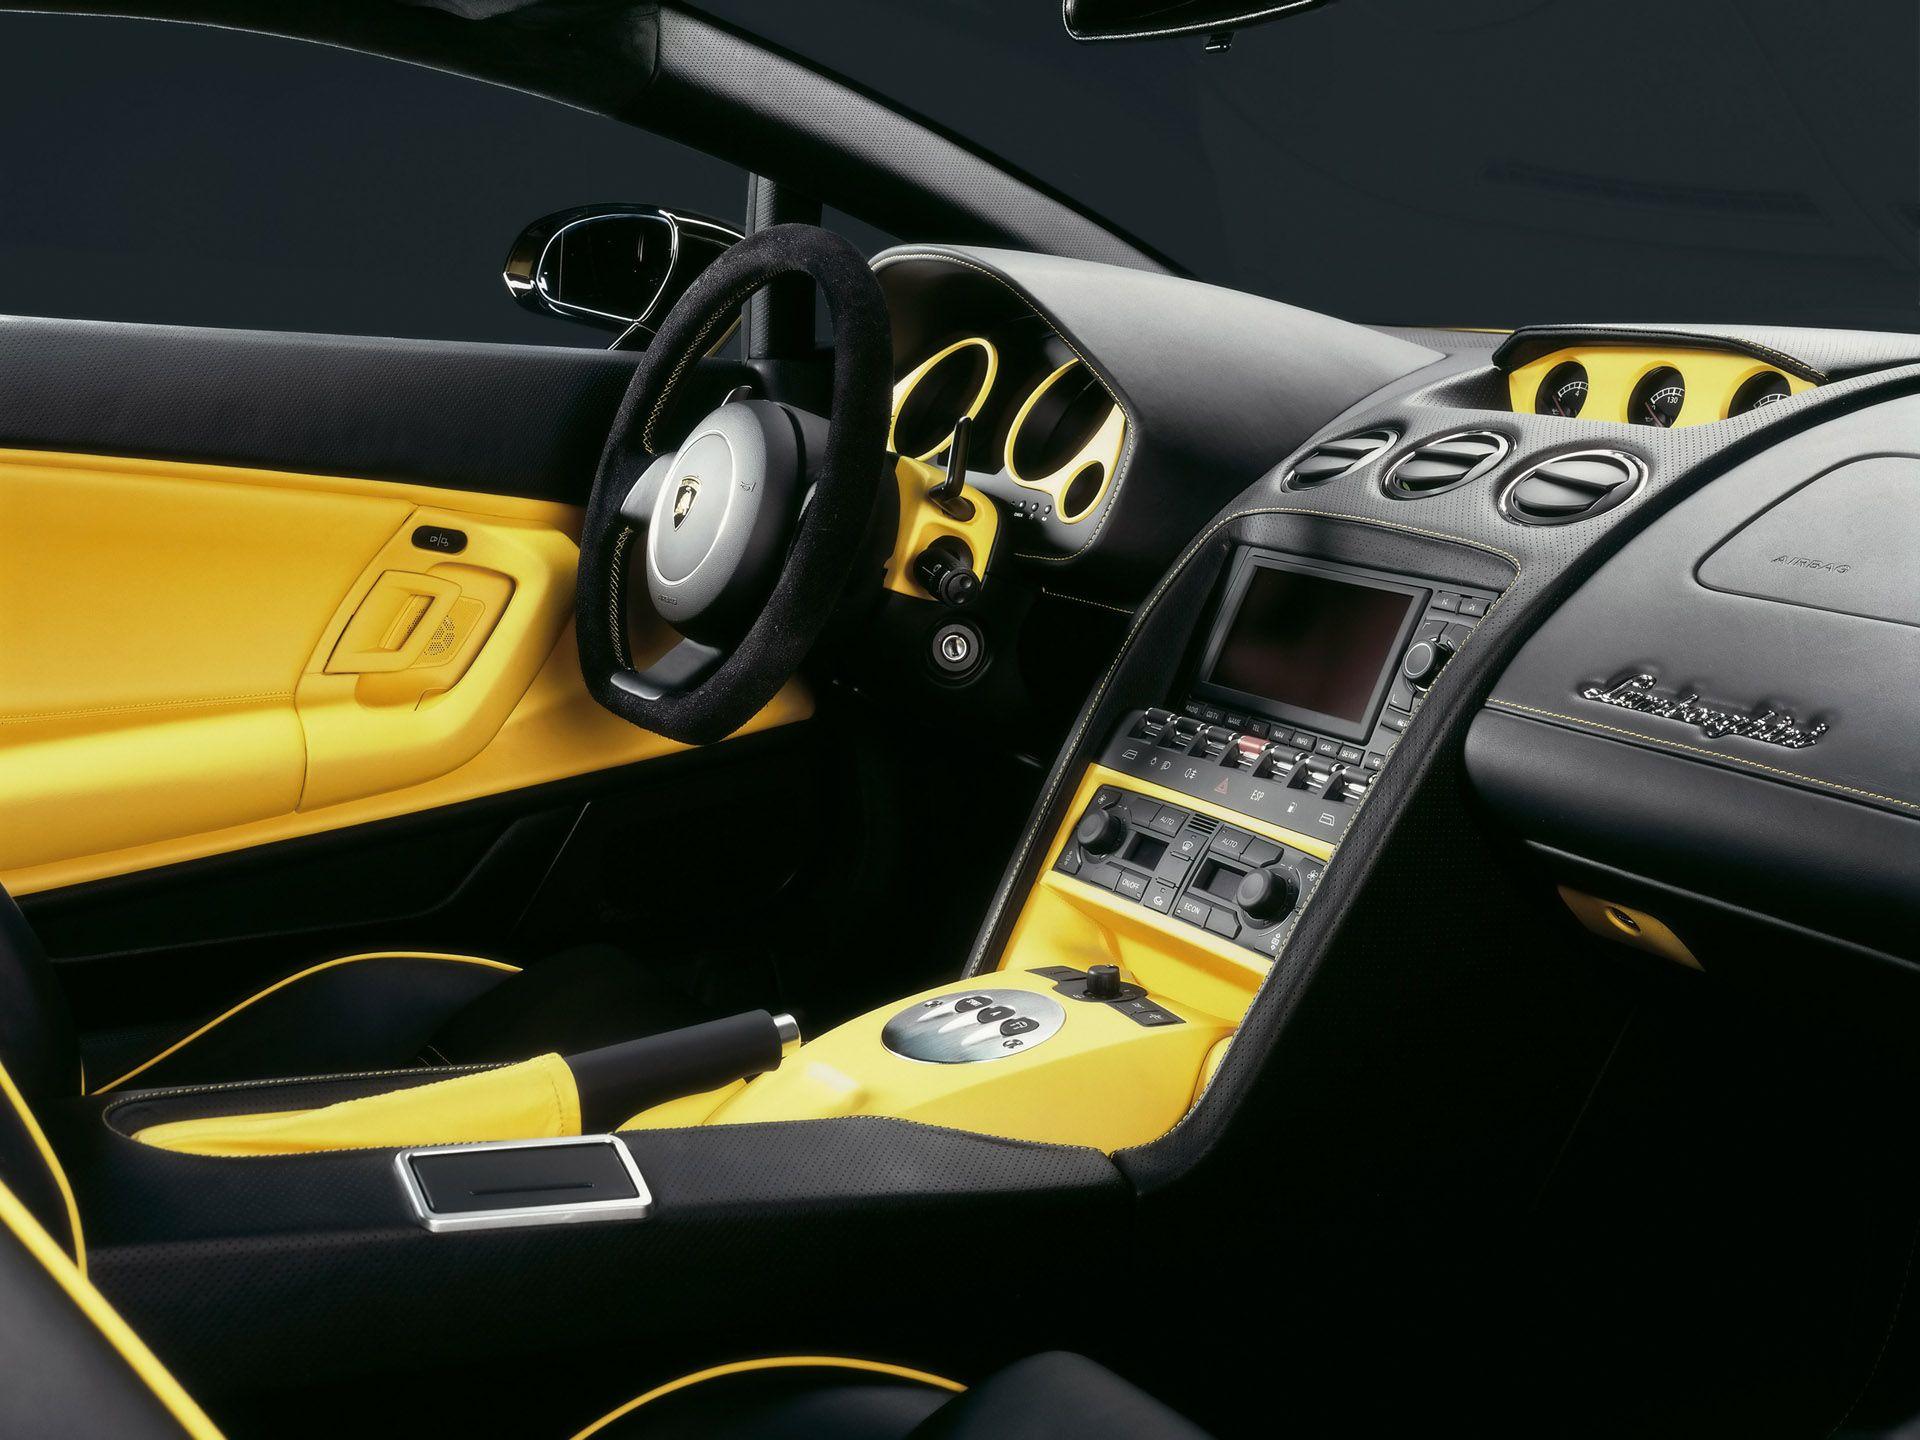 Lamborghini ankonian concept interior lamborghini - Ferrari Vs Lamborghini